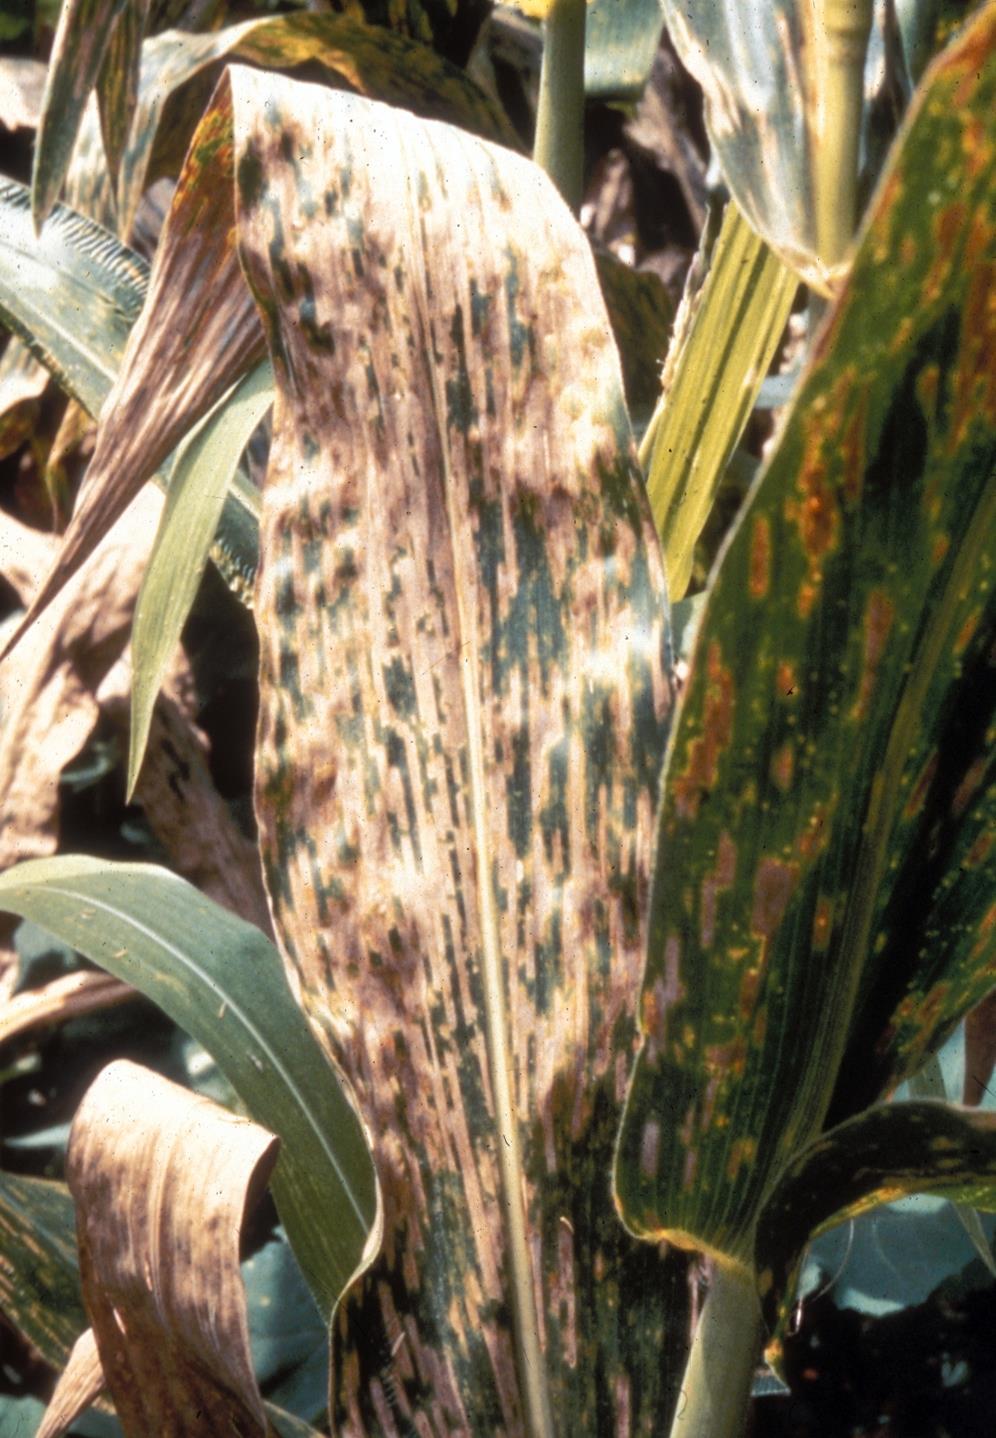 Cercospora_leaf_spot_4.jpg